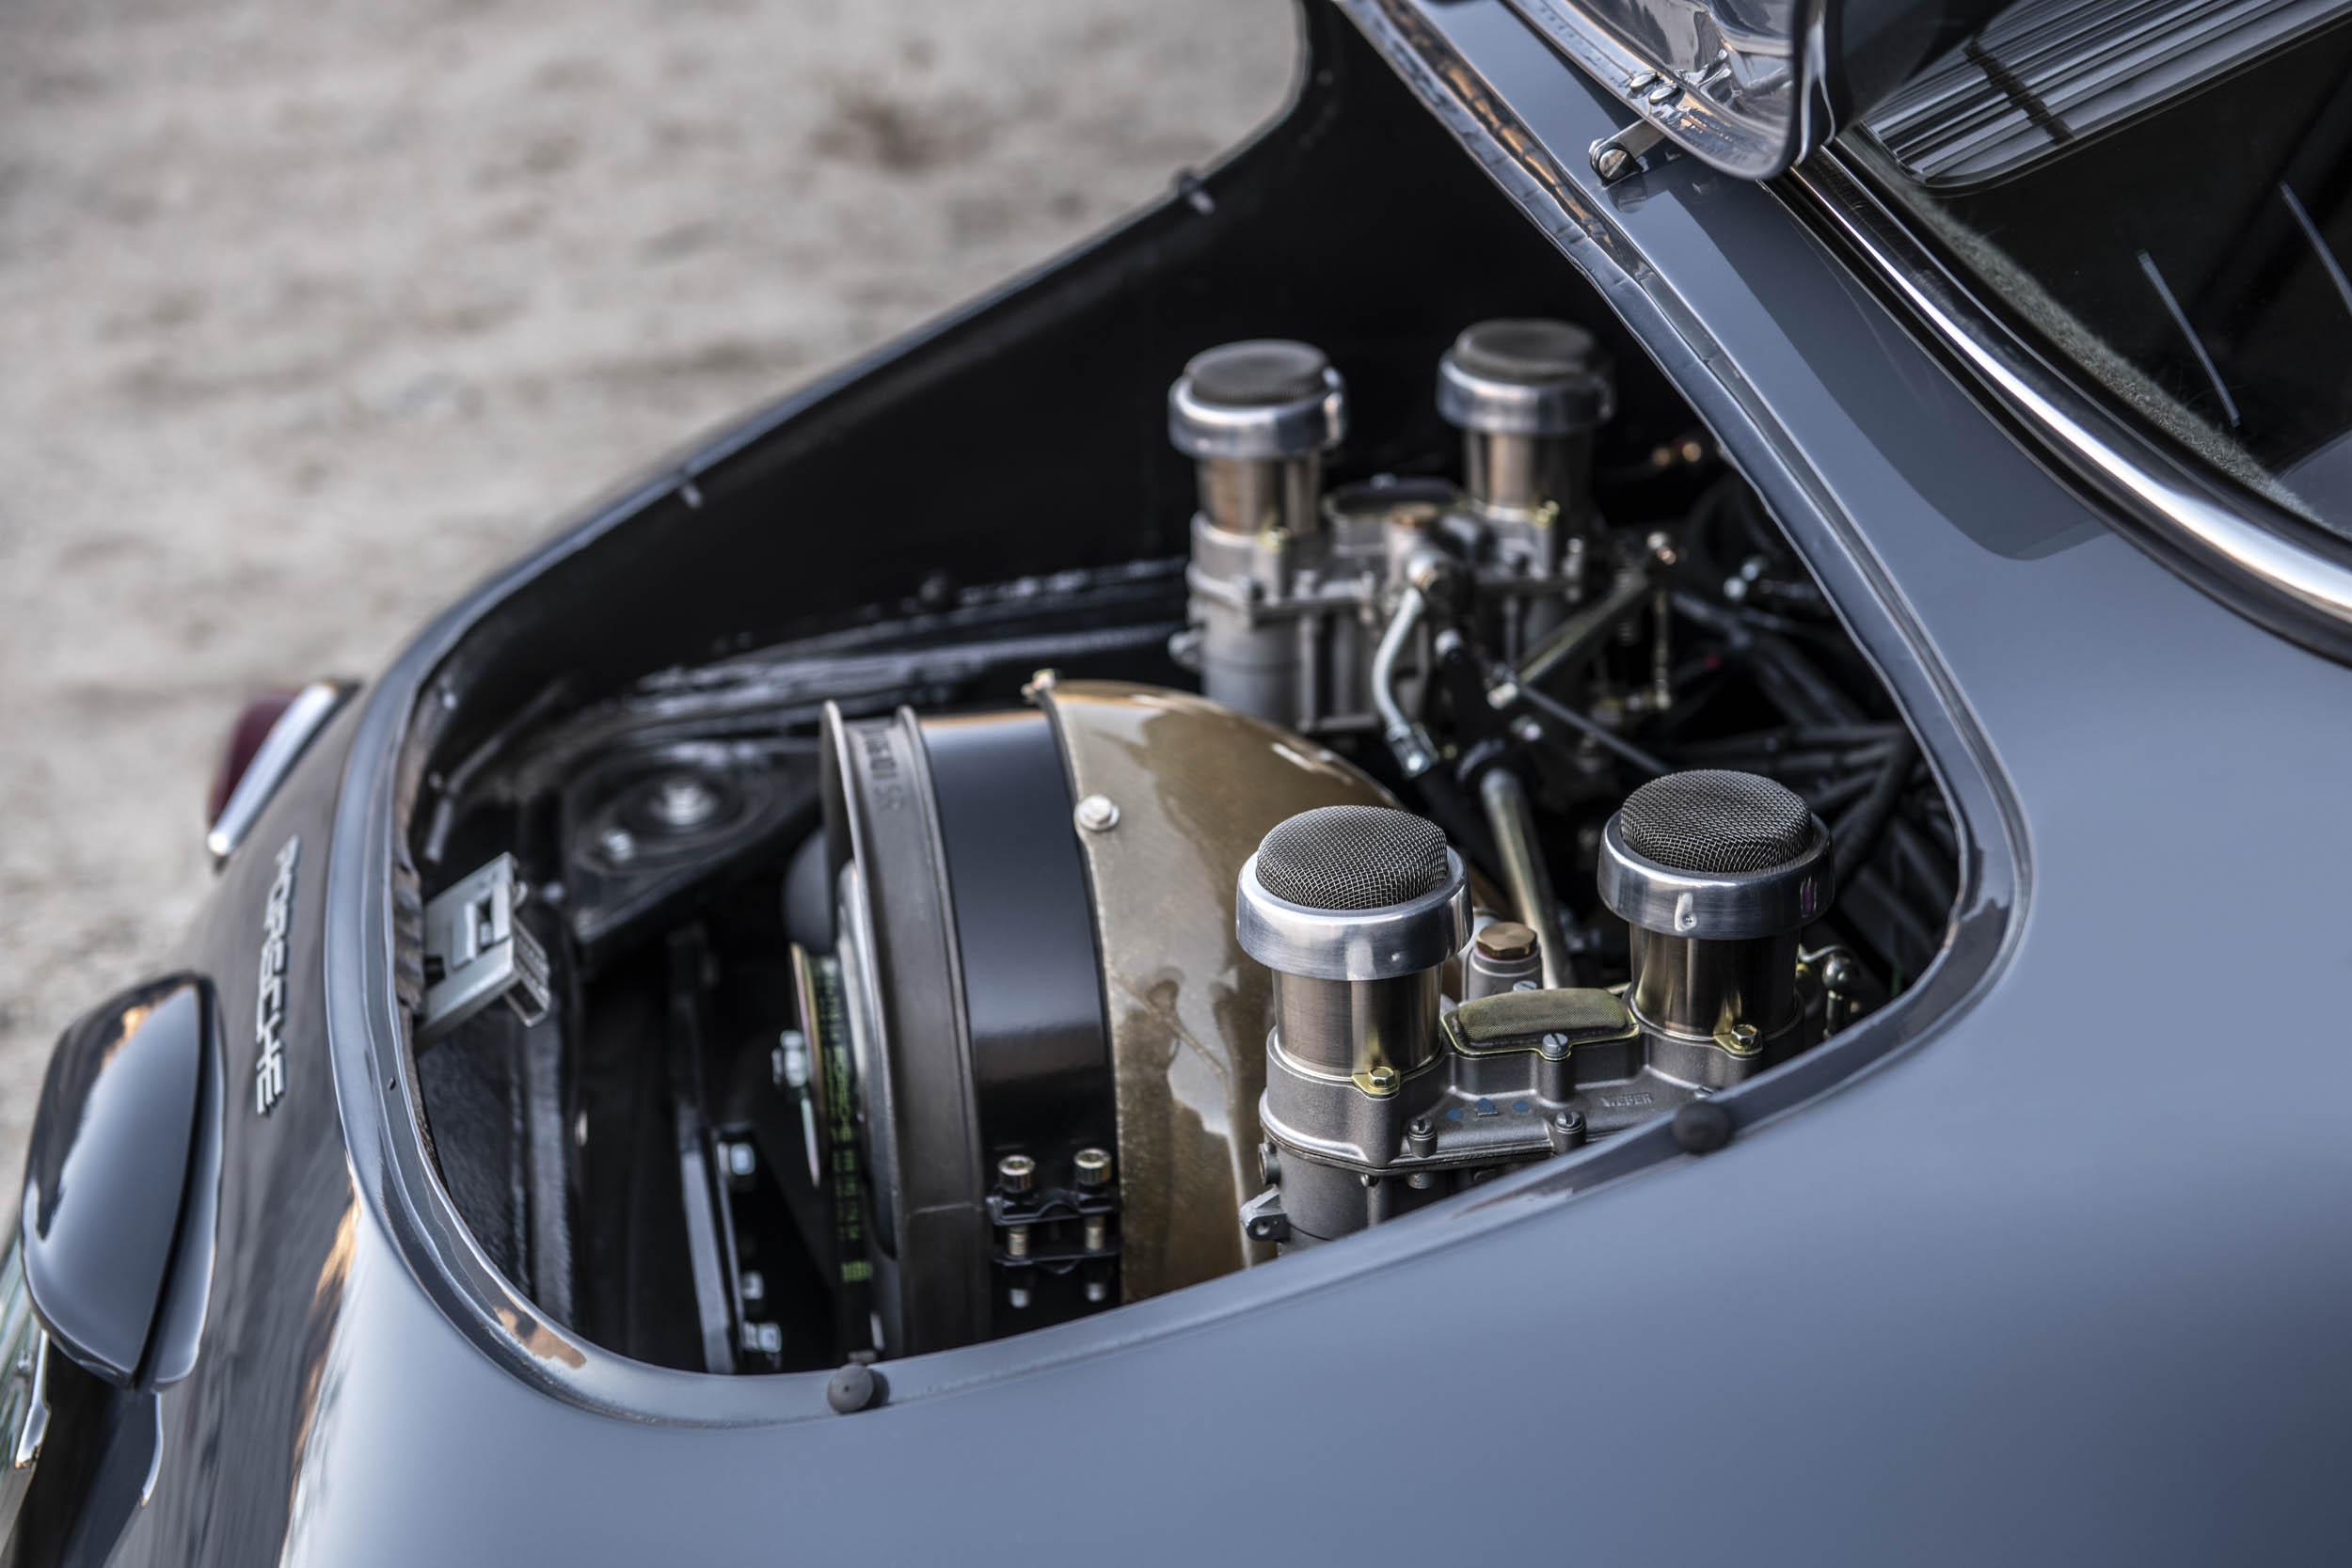 Emory Porsche 356 C4S Allrad engine